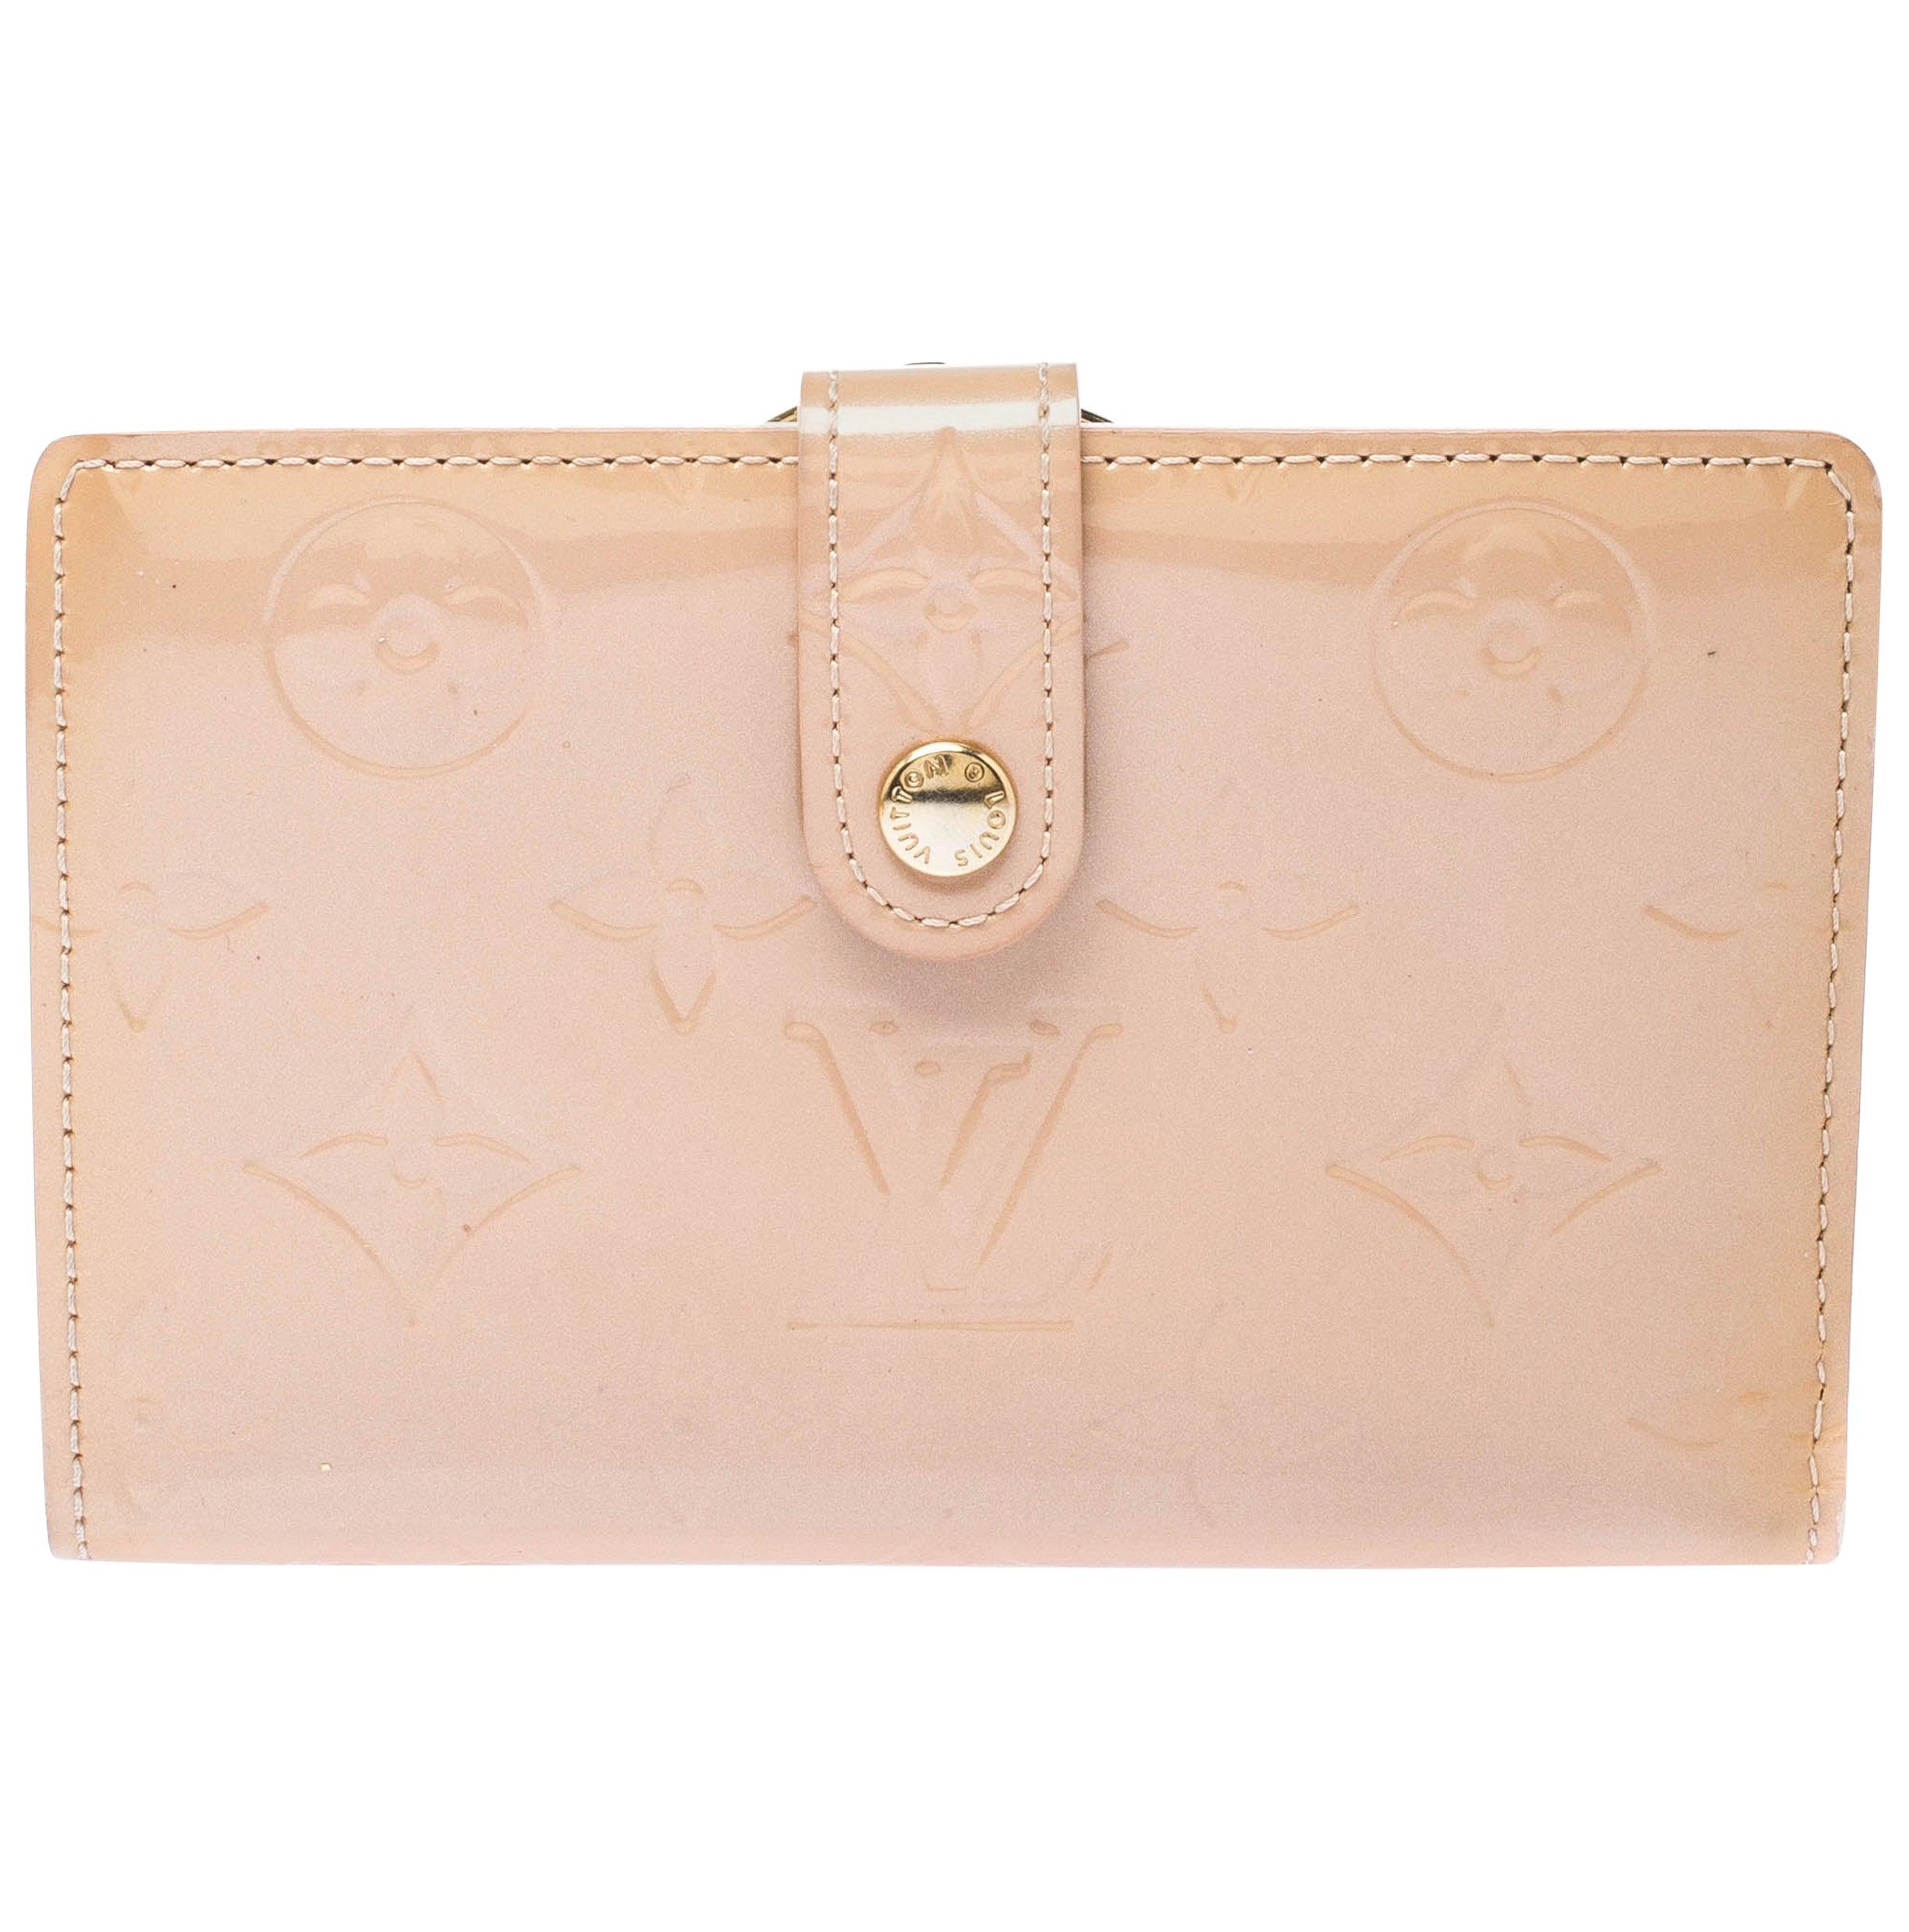 Louis Vuitton Rose Florentine Monogram Vernis French Wallet